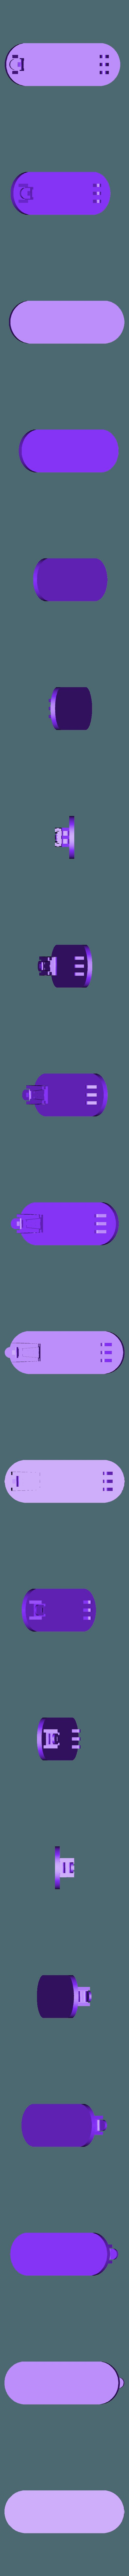 clip ceinture motorola t80.stl Download free STL file Belt clip walkie-talkie motorola T80 • Model to 3D print, Tom_le_Belk